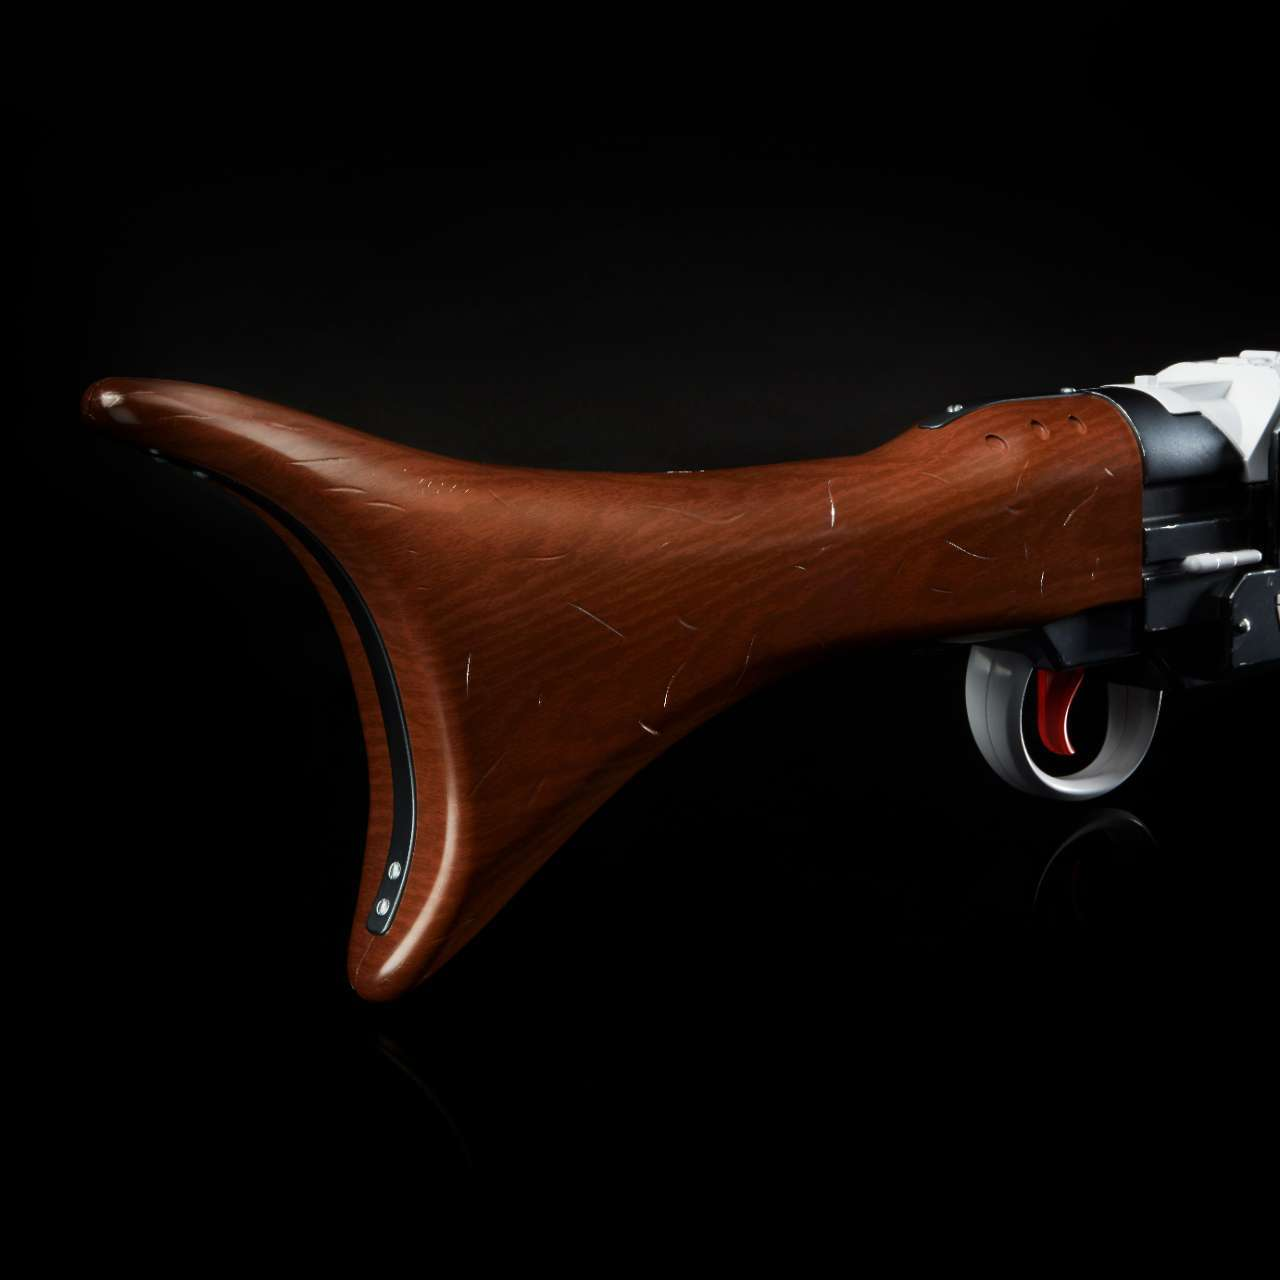 Nerf Star Wars The Mandalorian Amban Phase-pulse Blaster 7